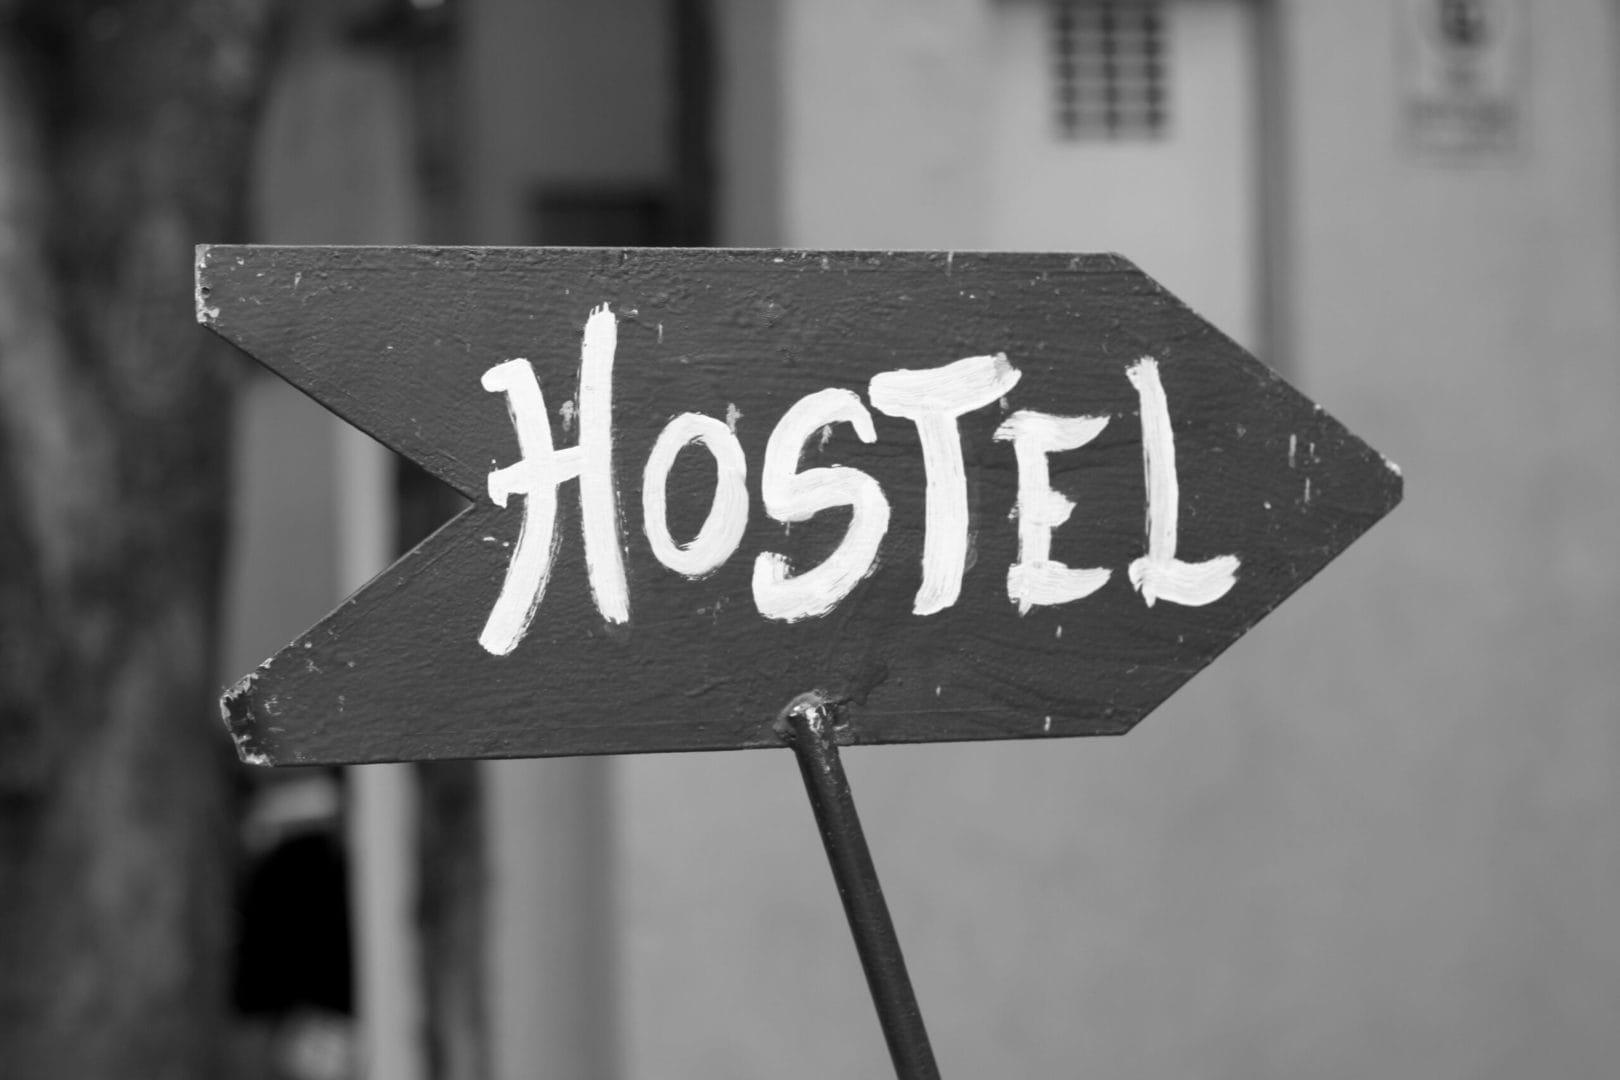 Studietur hostel sign